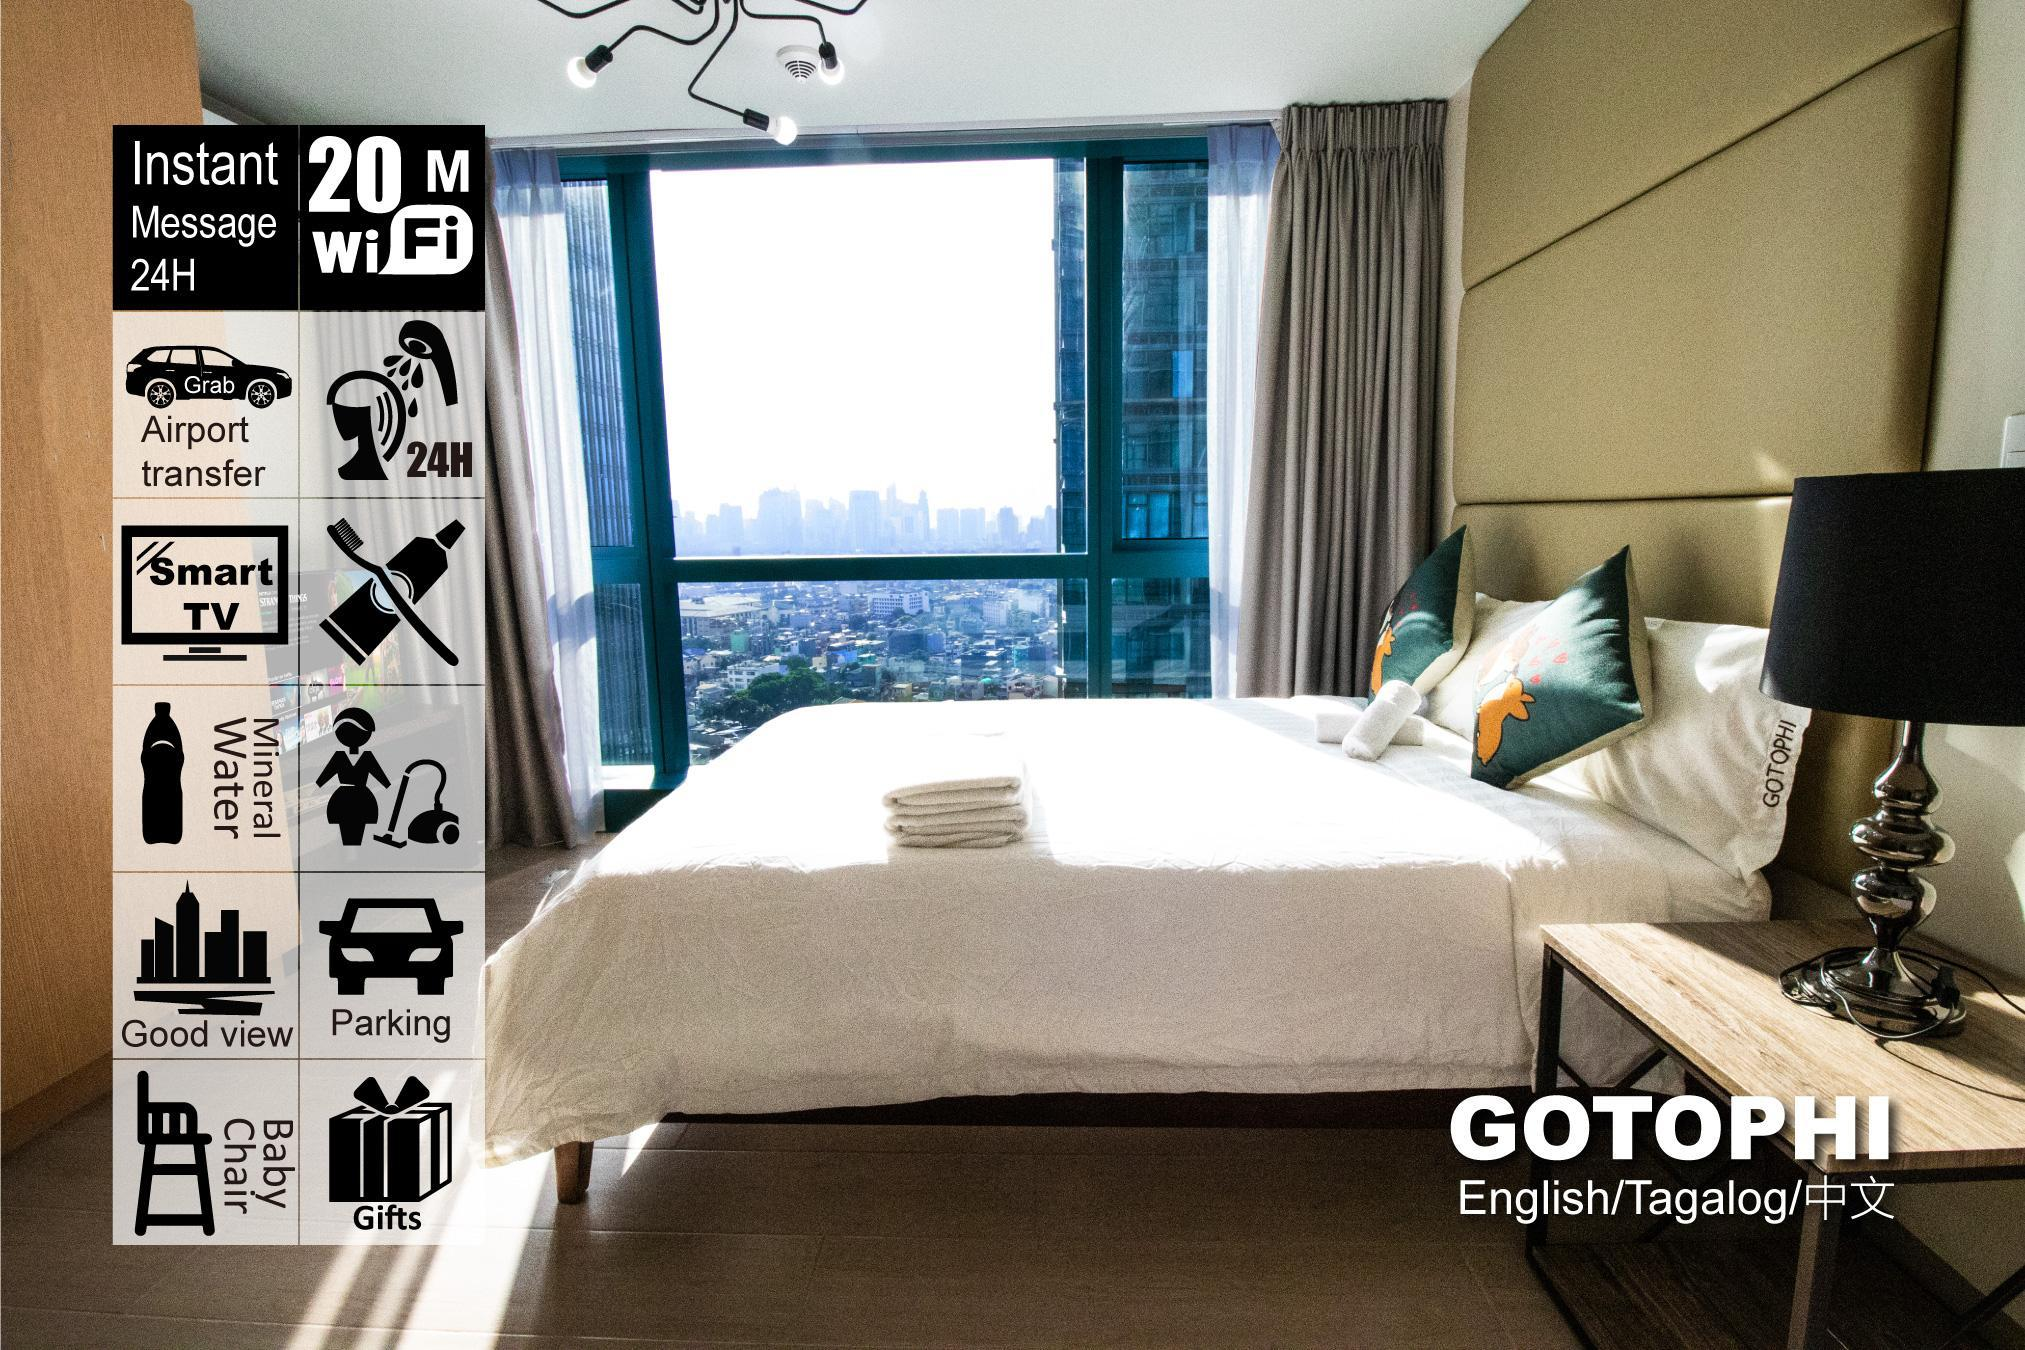 One Uptown Residence BGC Gotophi 5Star Hotel B